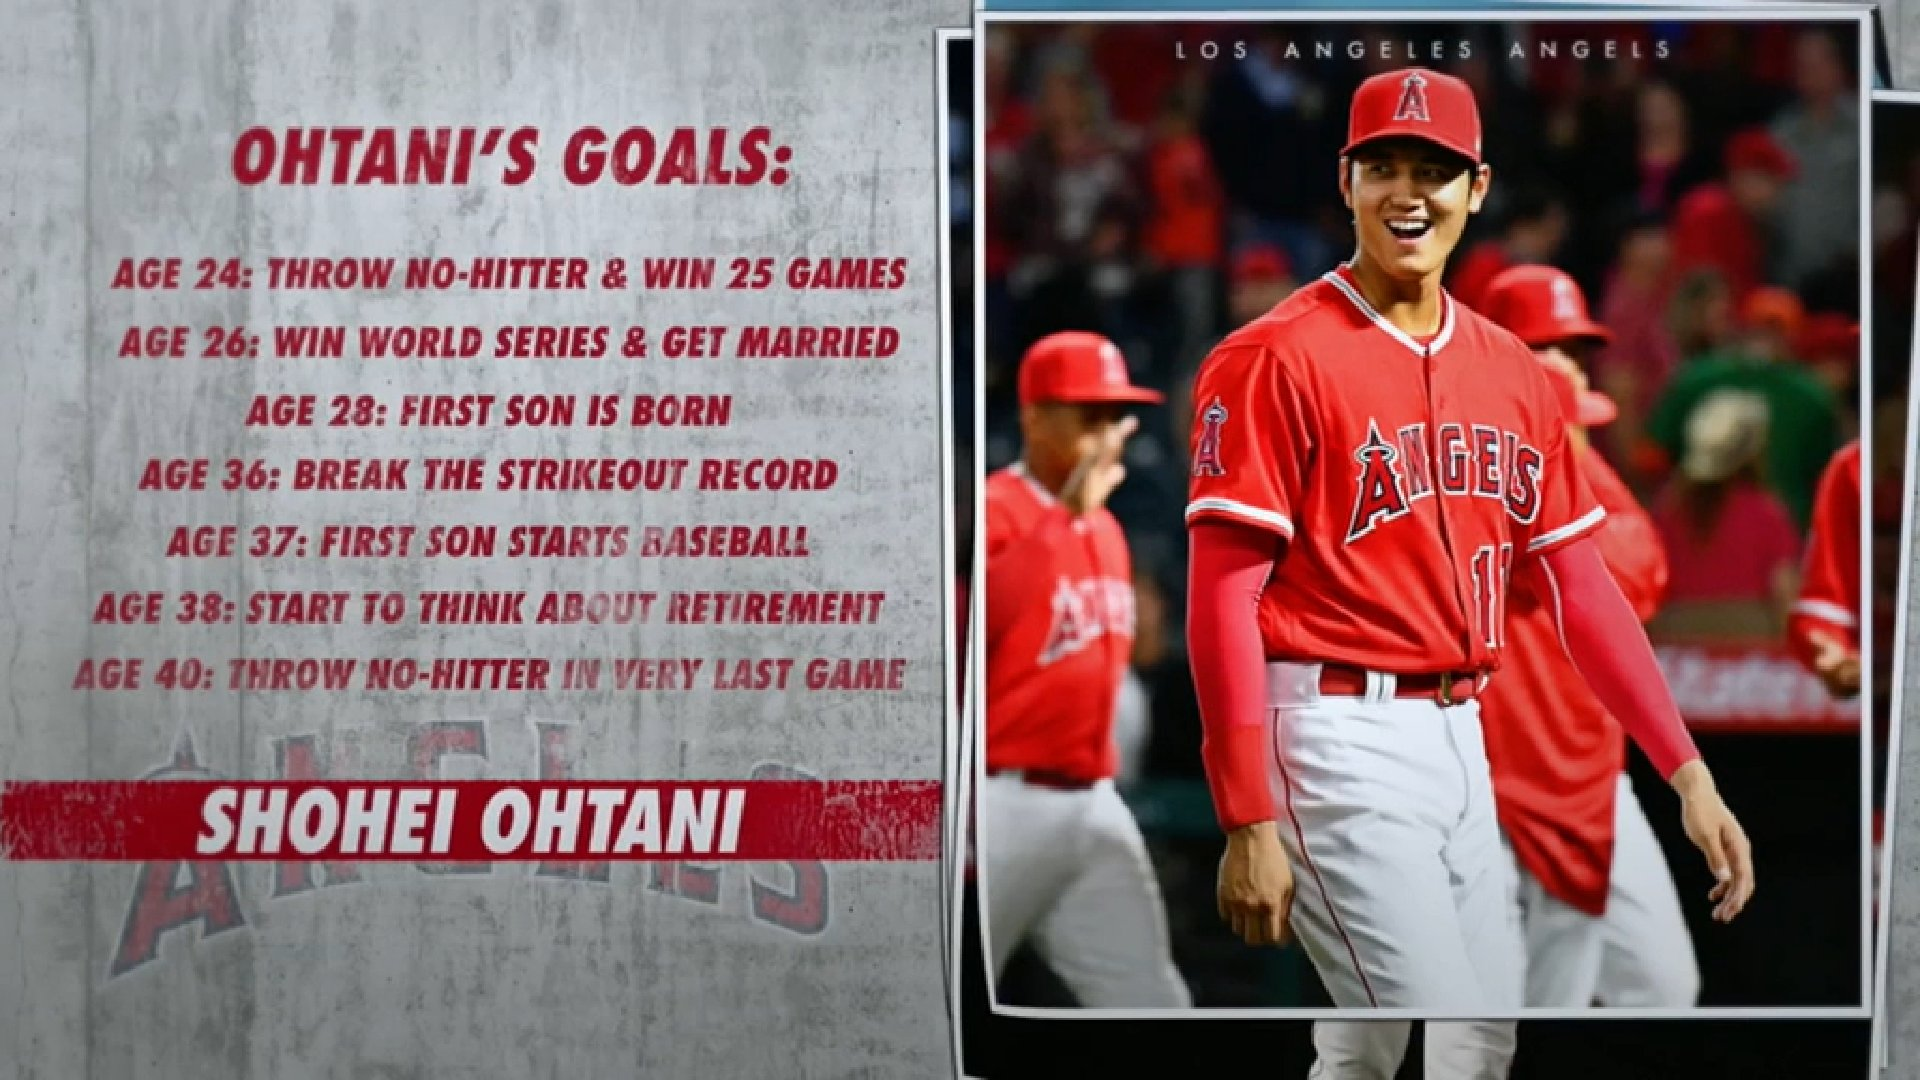 Shohei Ohtani set some lofty goals in high school. �� https://t.co/m73x5Vunhh